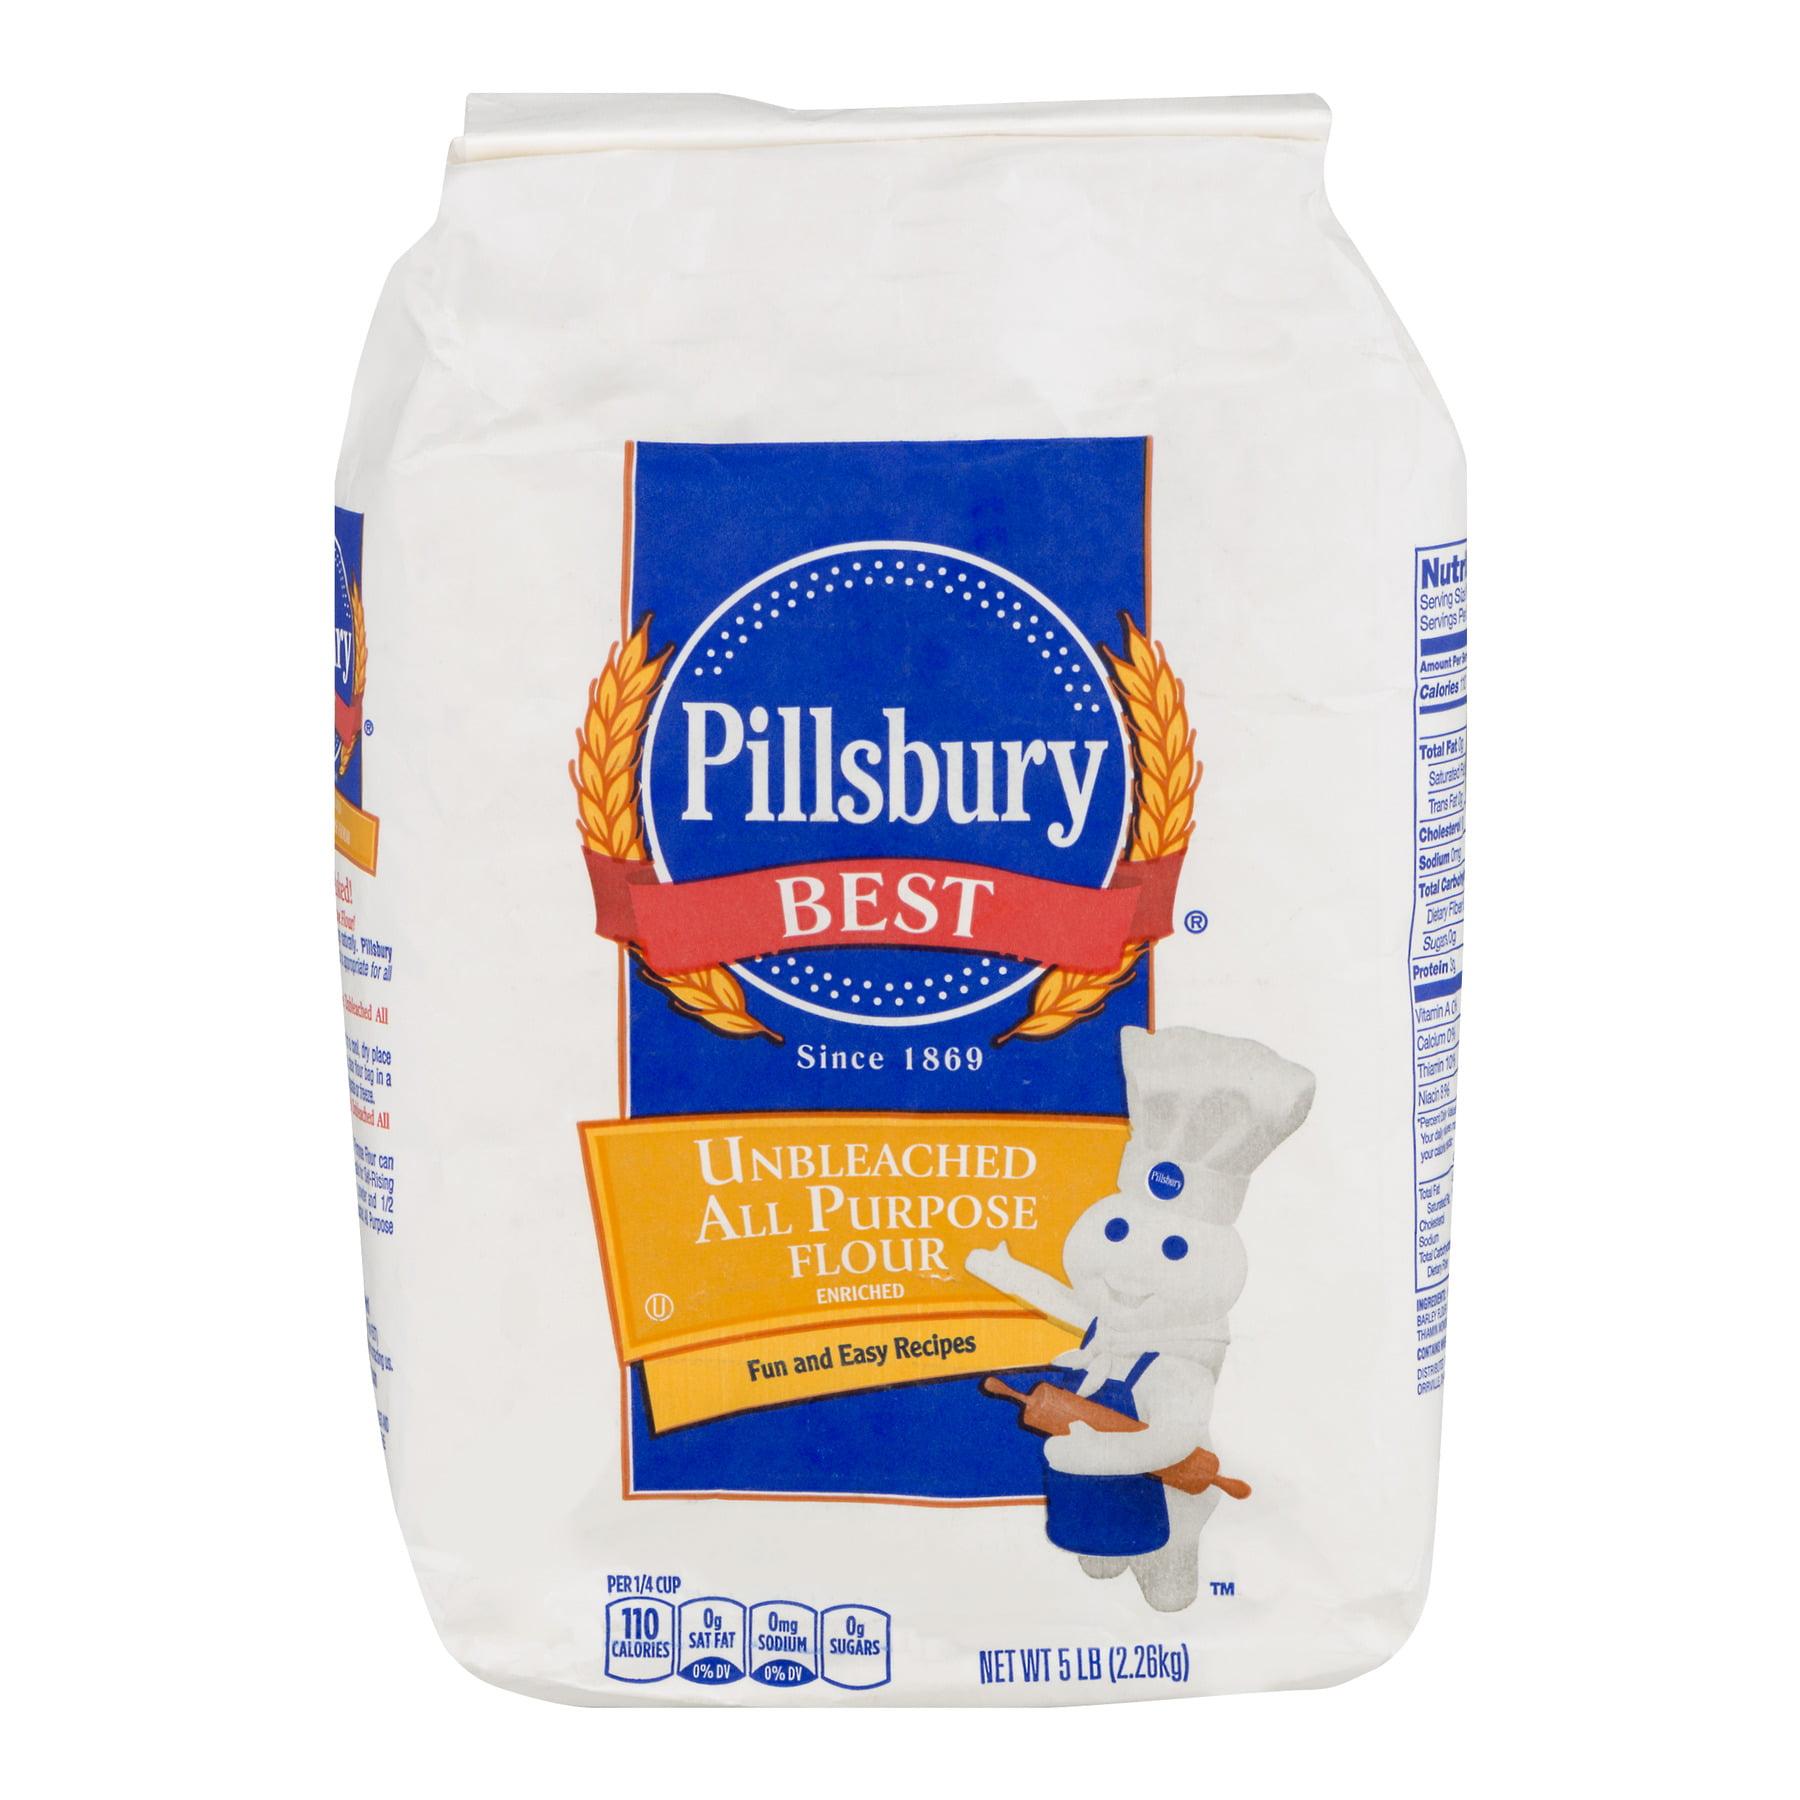 Pillsbury Best Unbleached All Purpose Flour, 5.0 LB